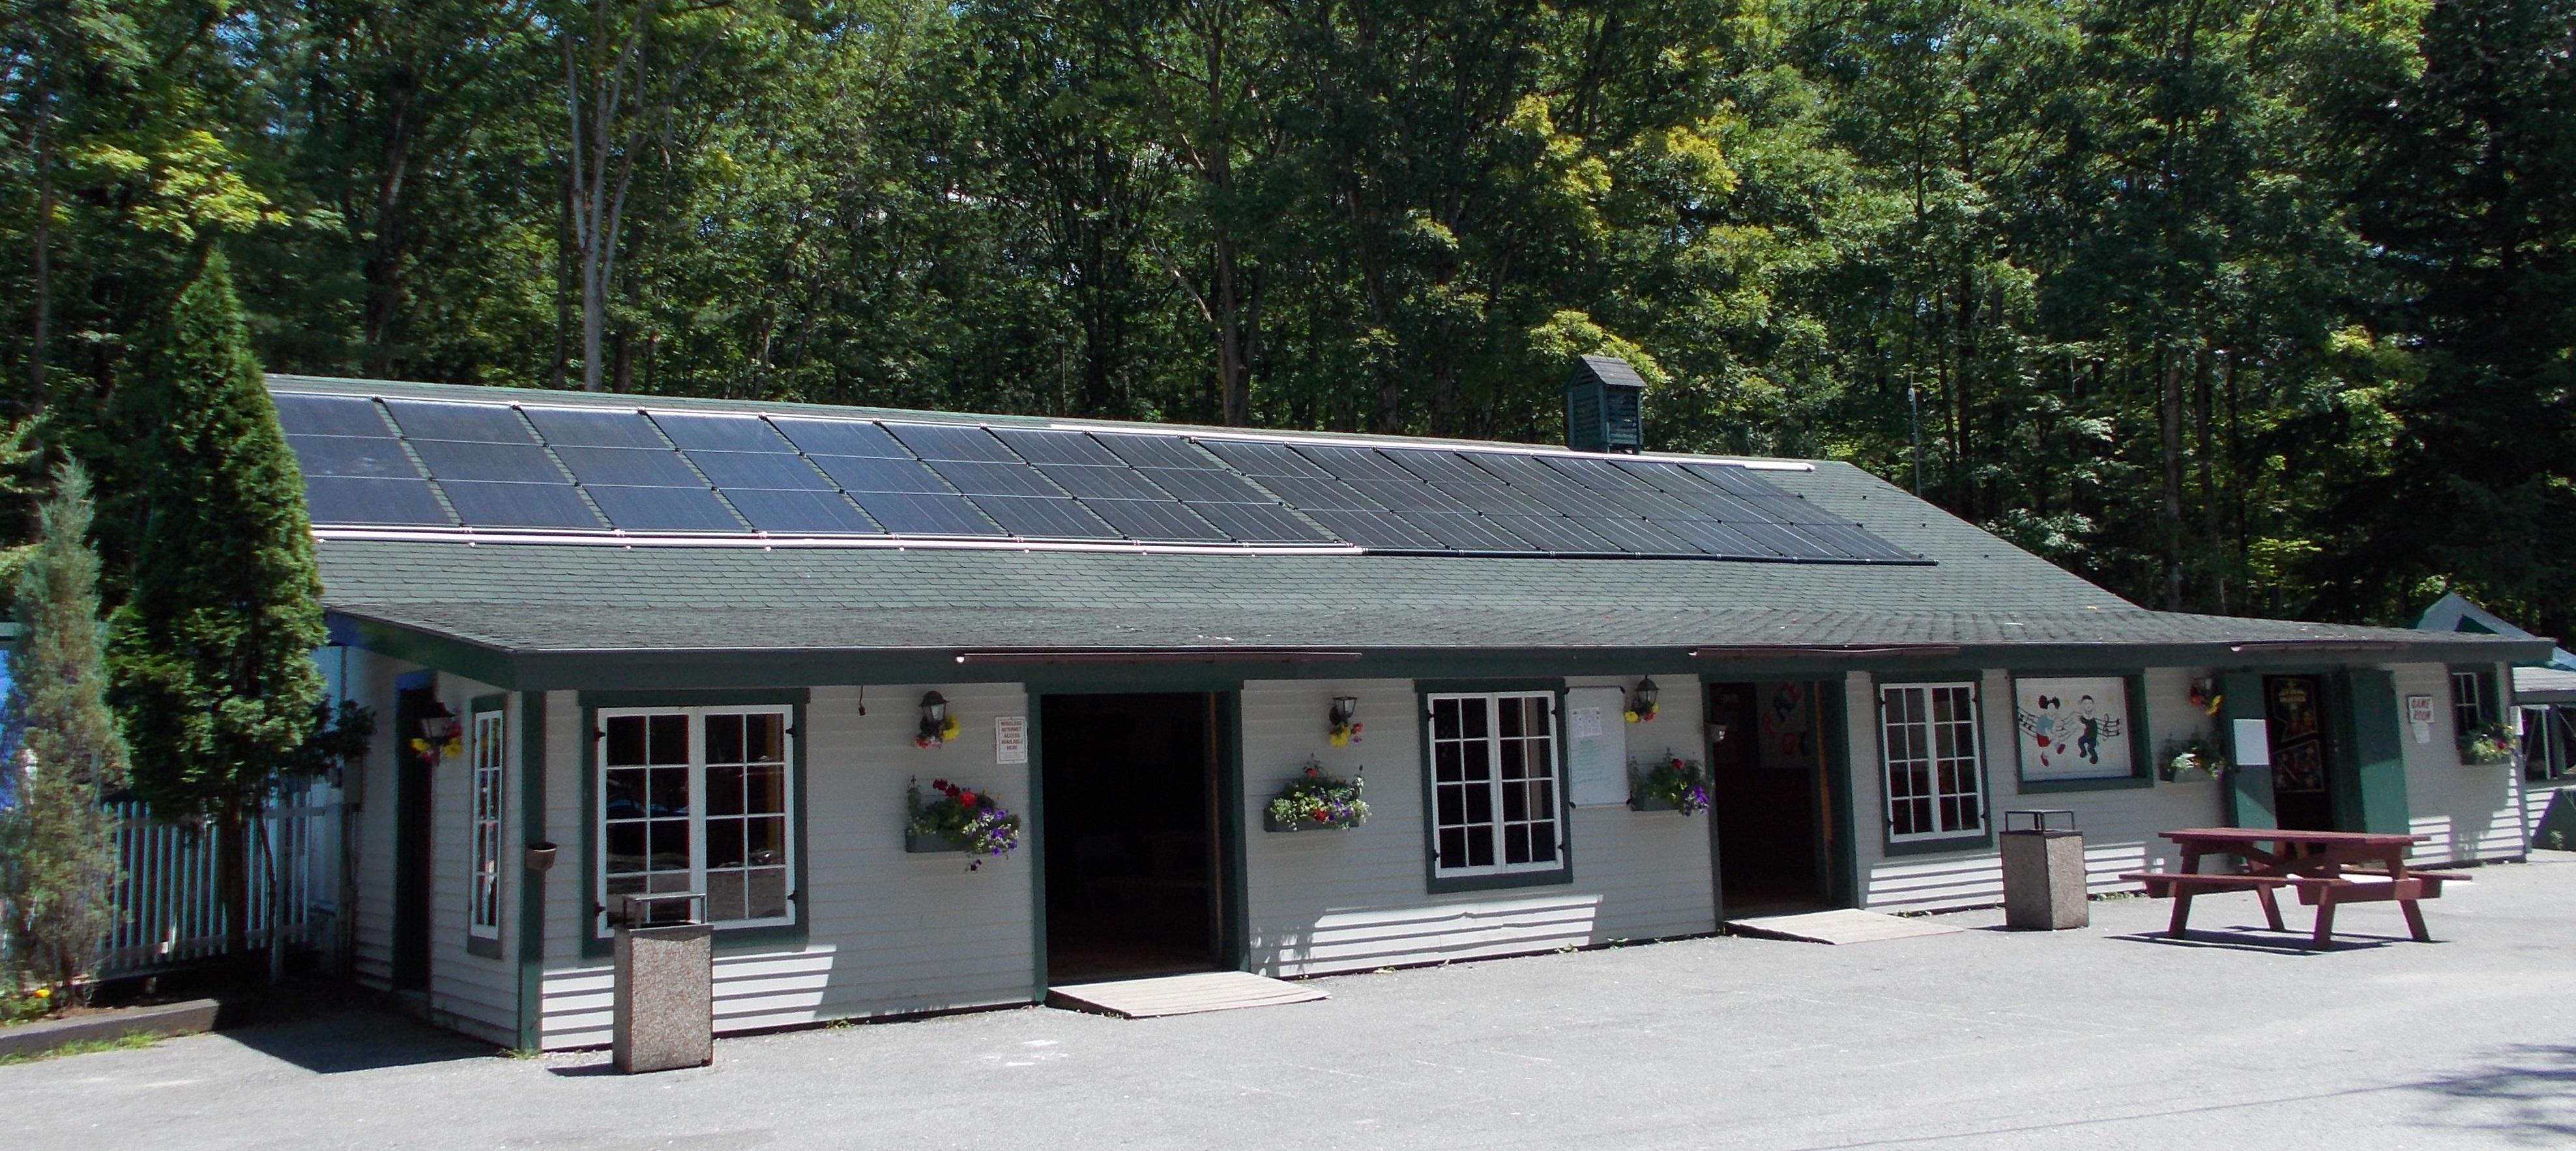 Kampersville-Solar-Pool-heater-2013-photo-cropped.jpg